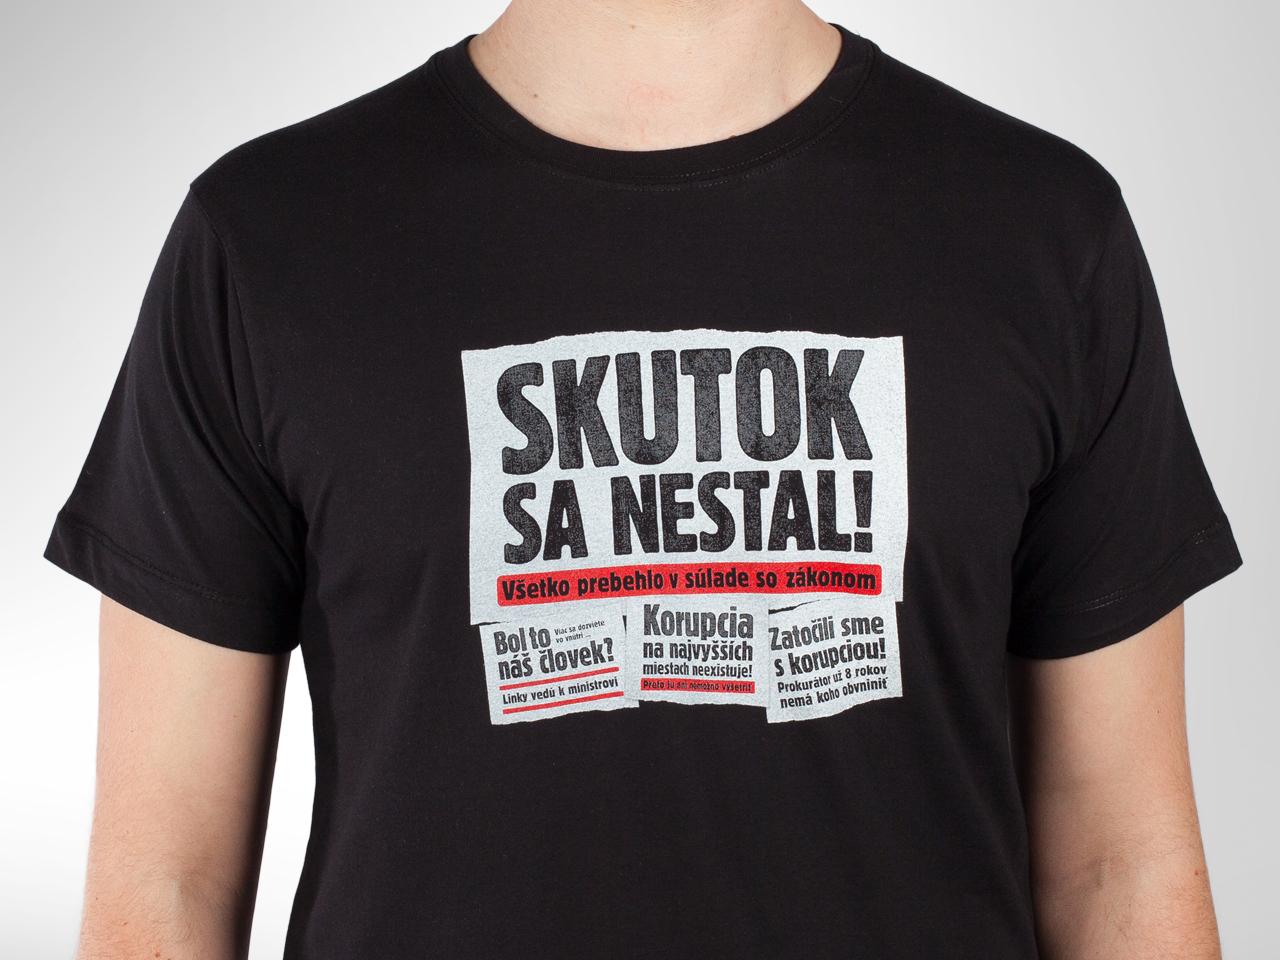 c1c4d0771 Skutok sa nestal! Black — Kompot.sk